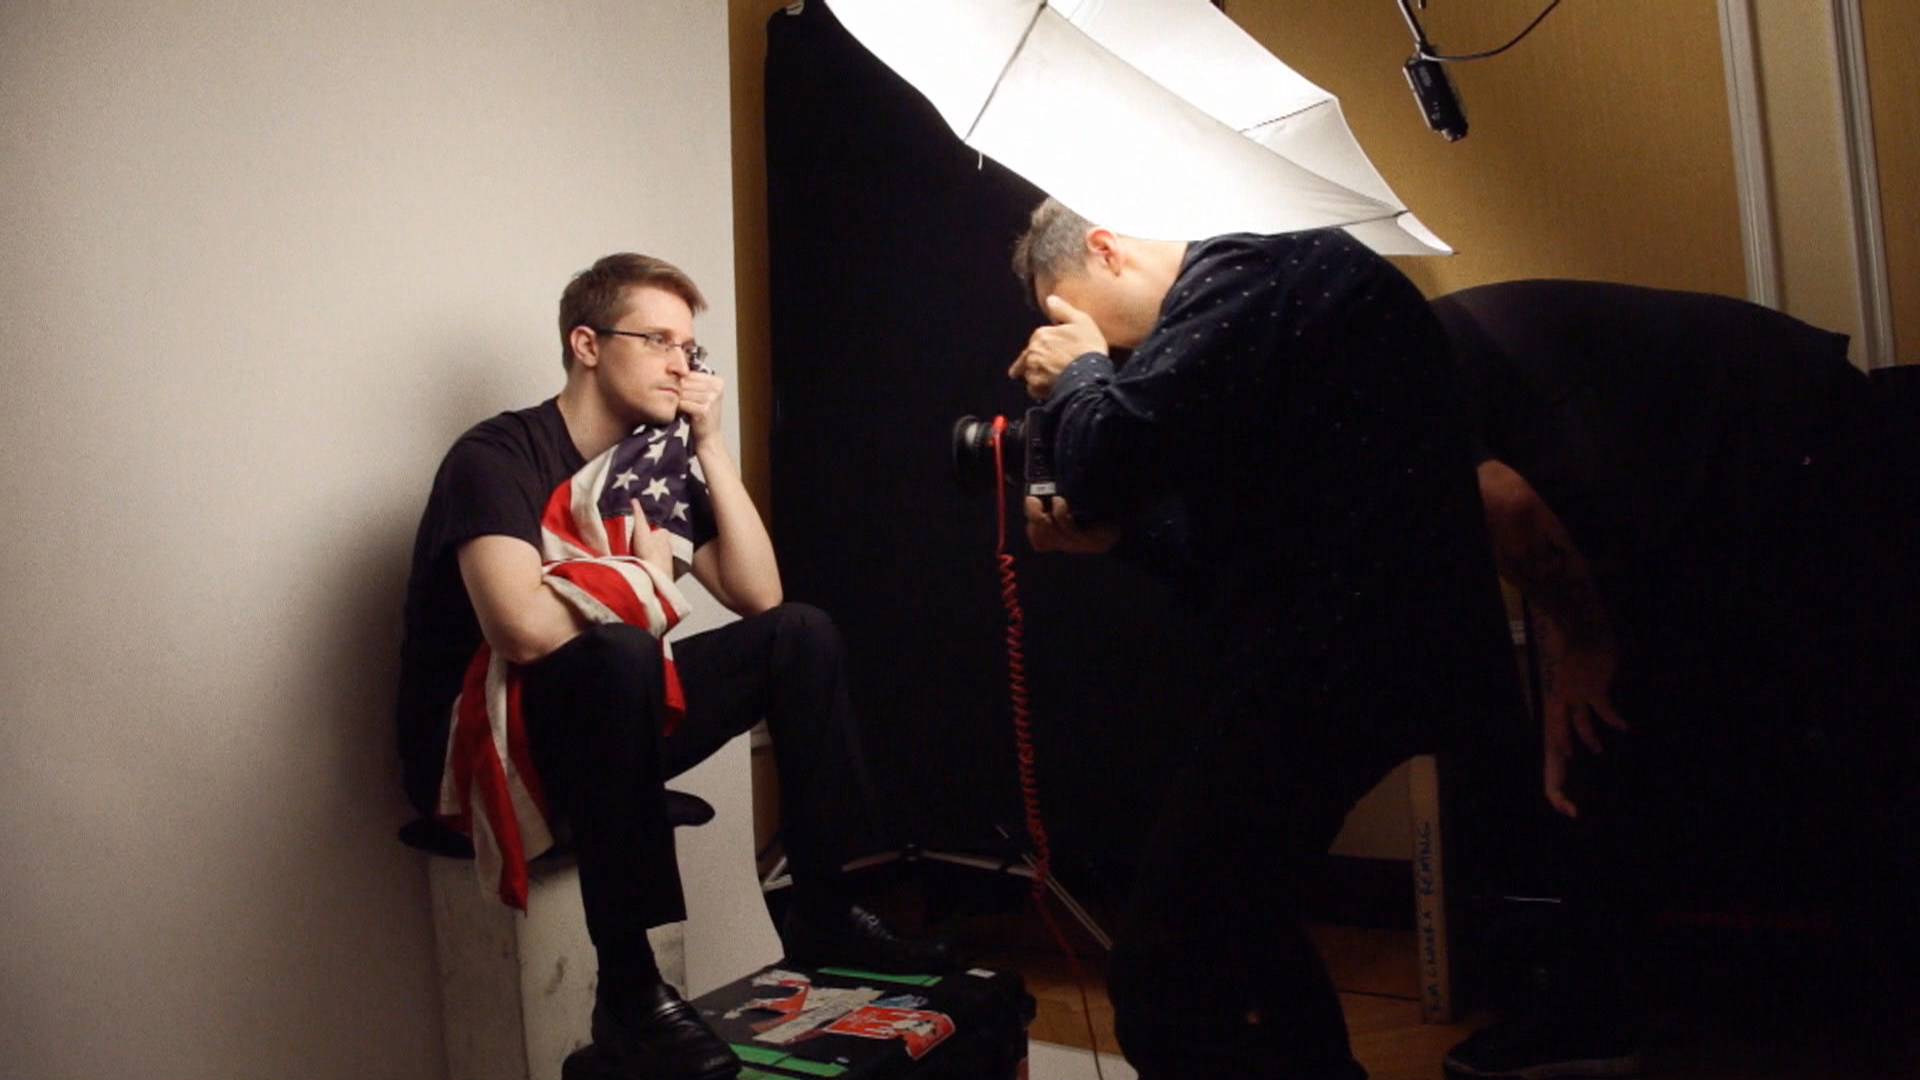 Edward Snowden tells WIRED magazine: I would \'volunteer for prison ...